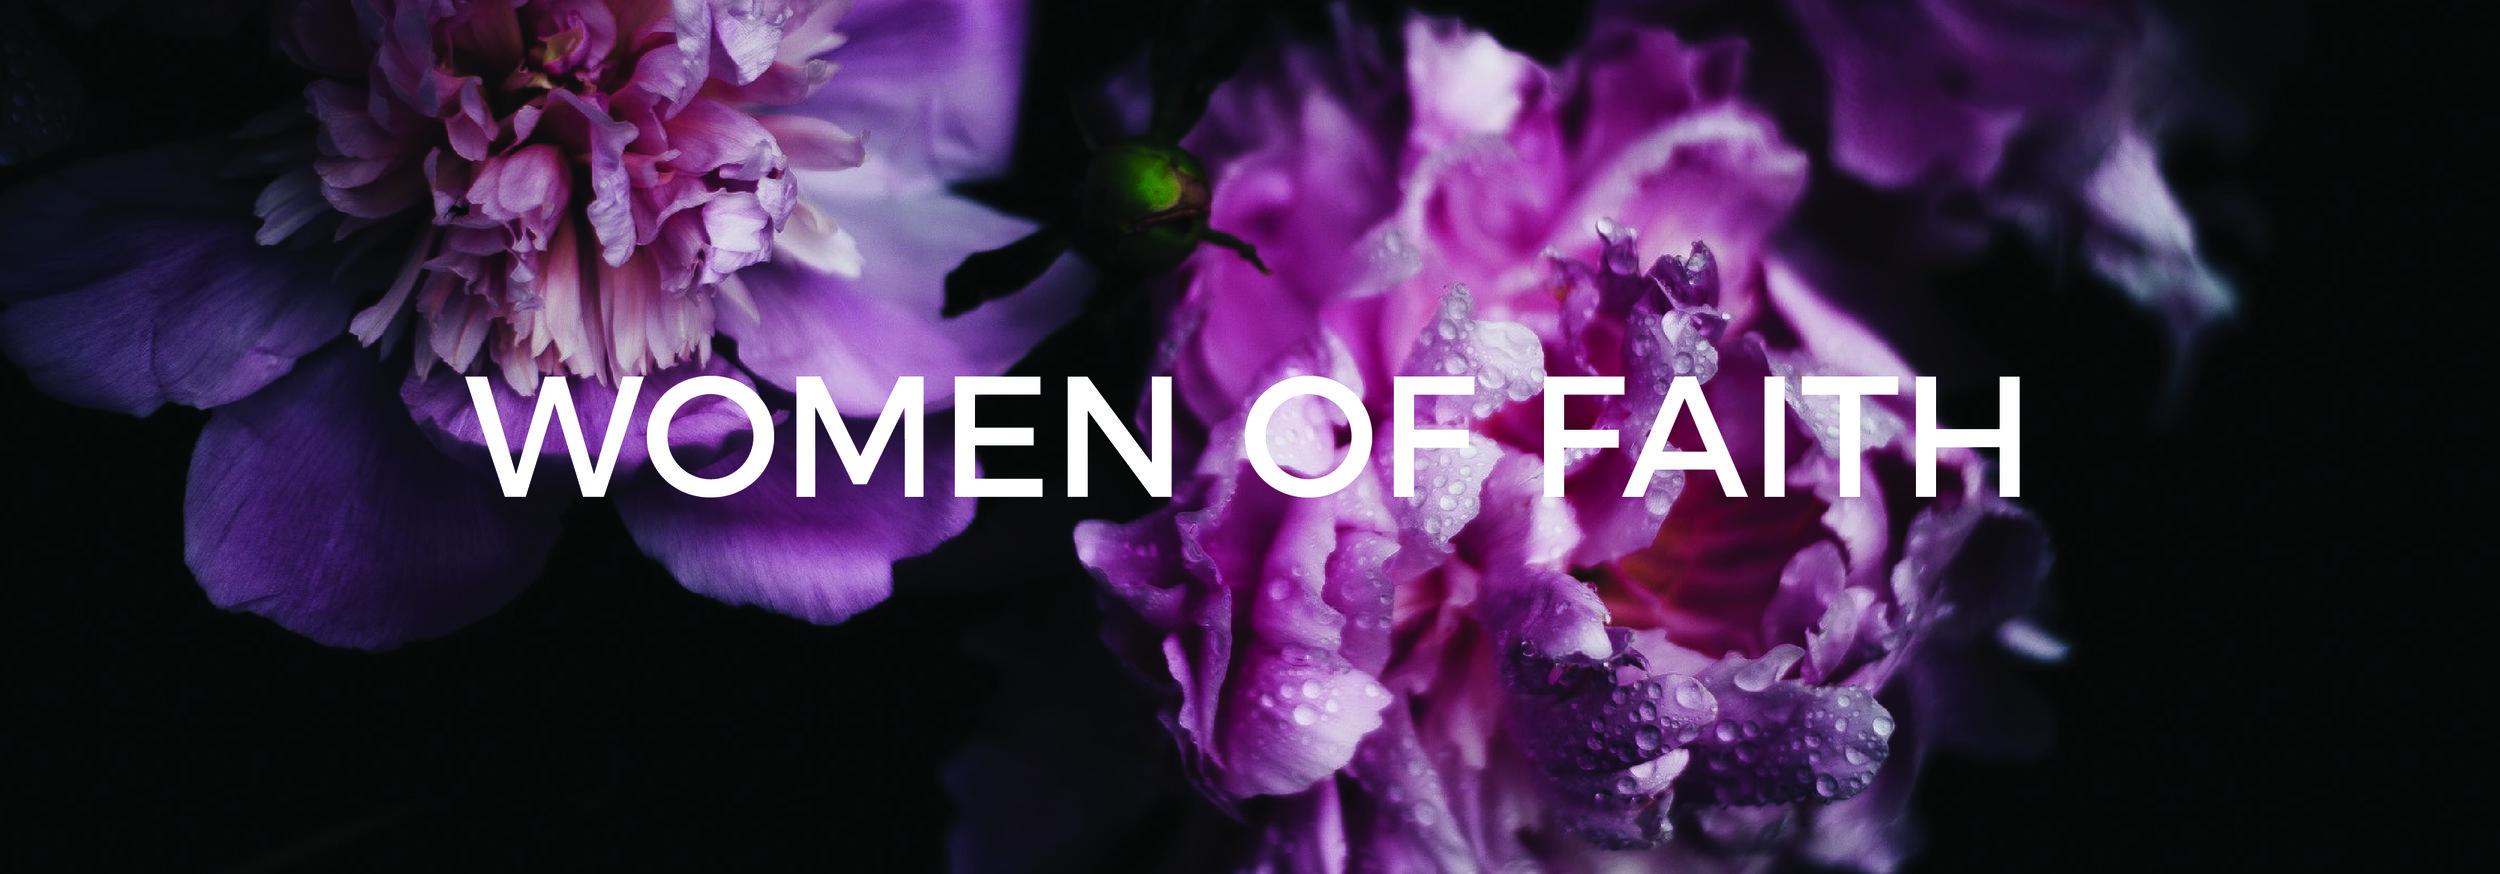 Women of Faith.jpg